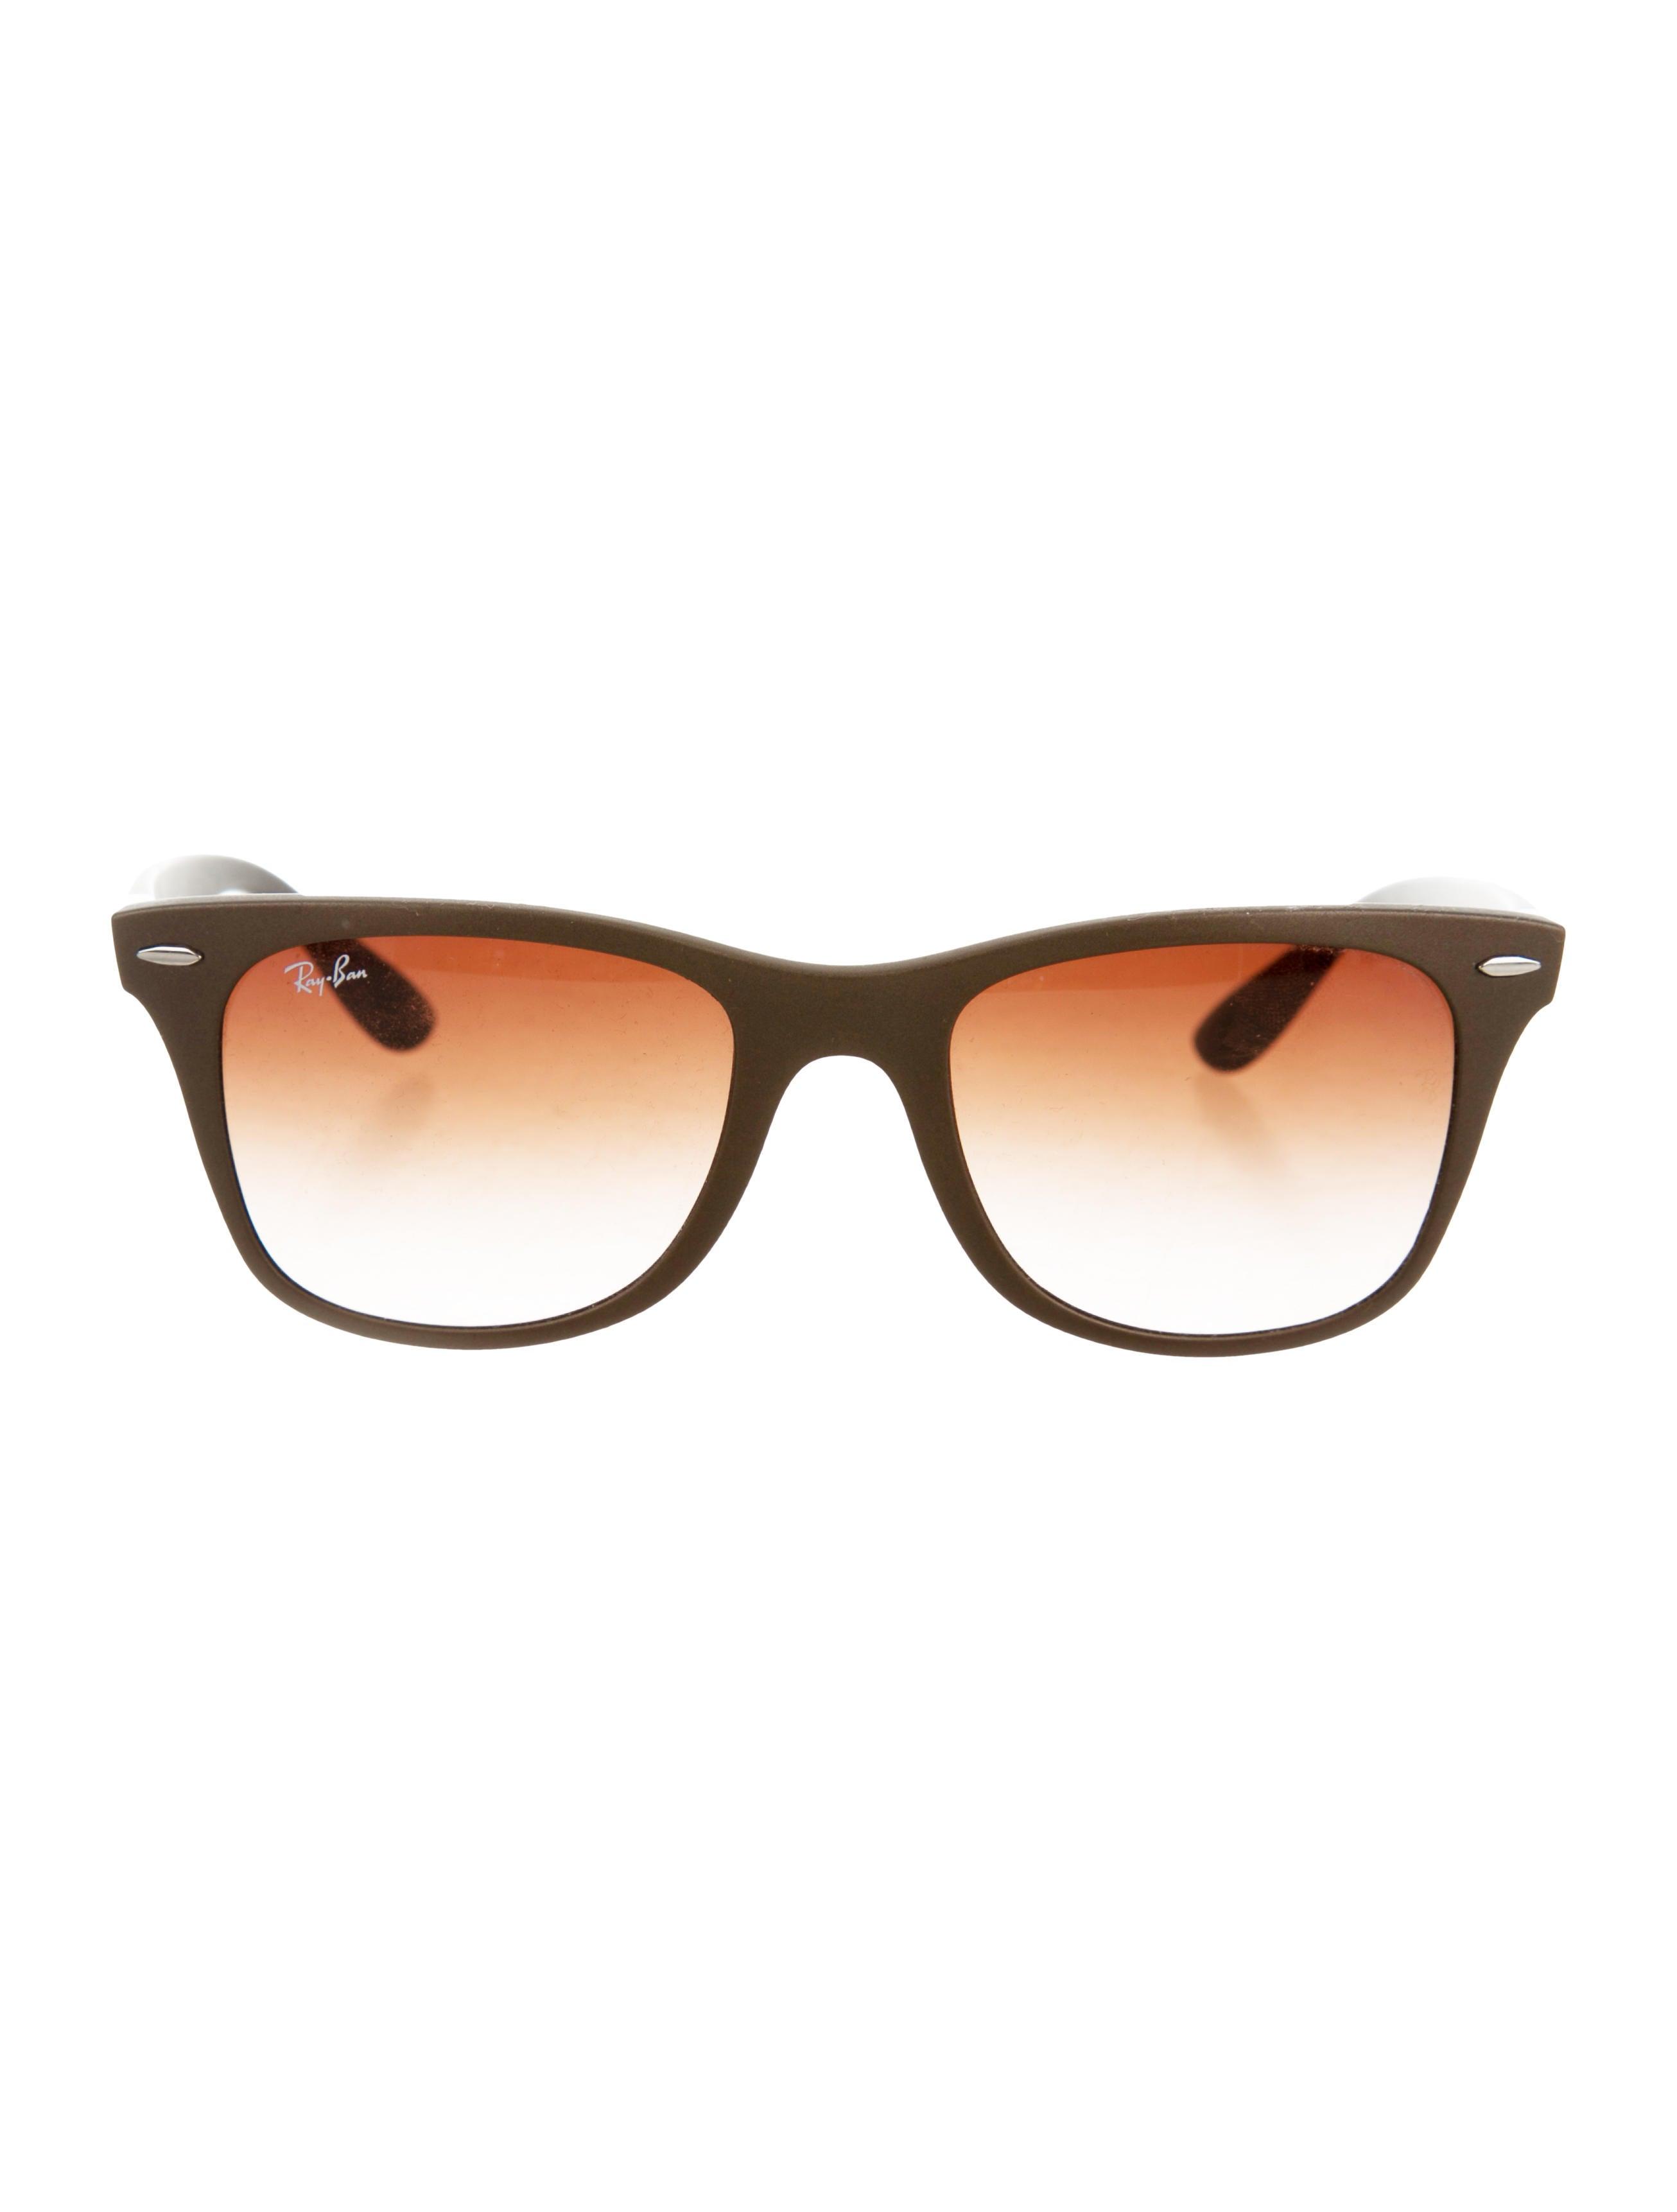 5d0973ab21a Ray-Ban Liteforce Wayfarer Sunglasses - Accessories - WRX24697